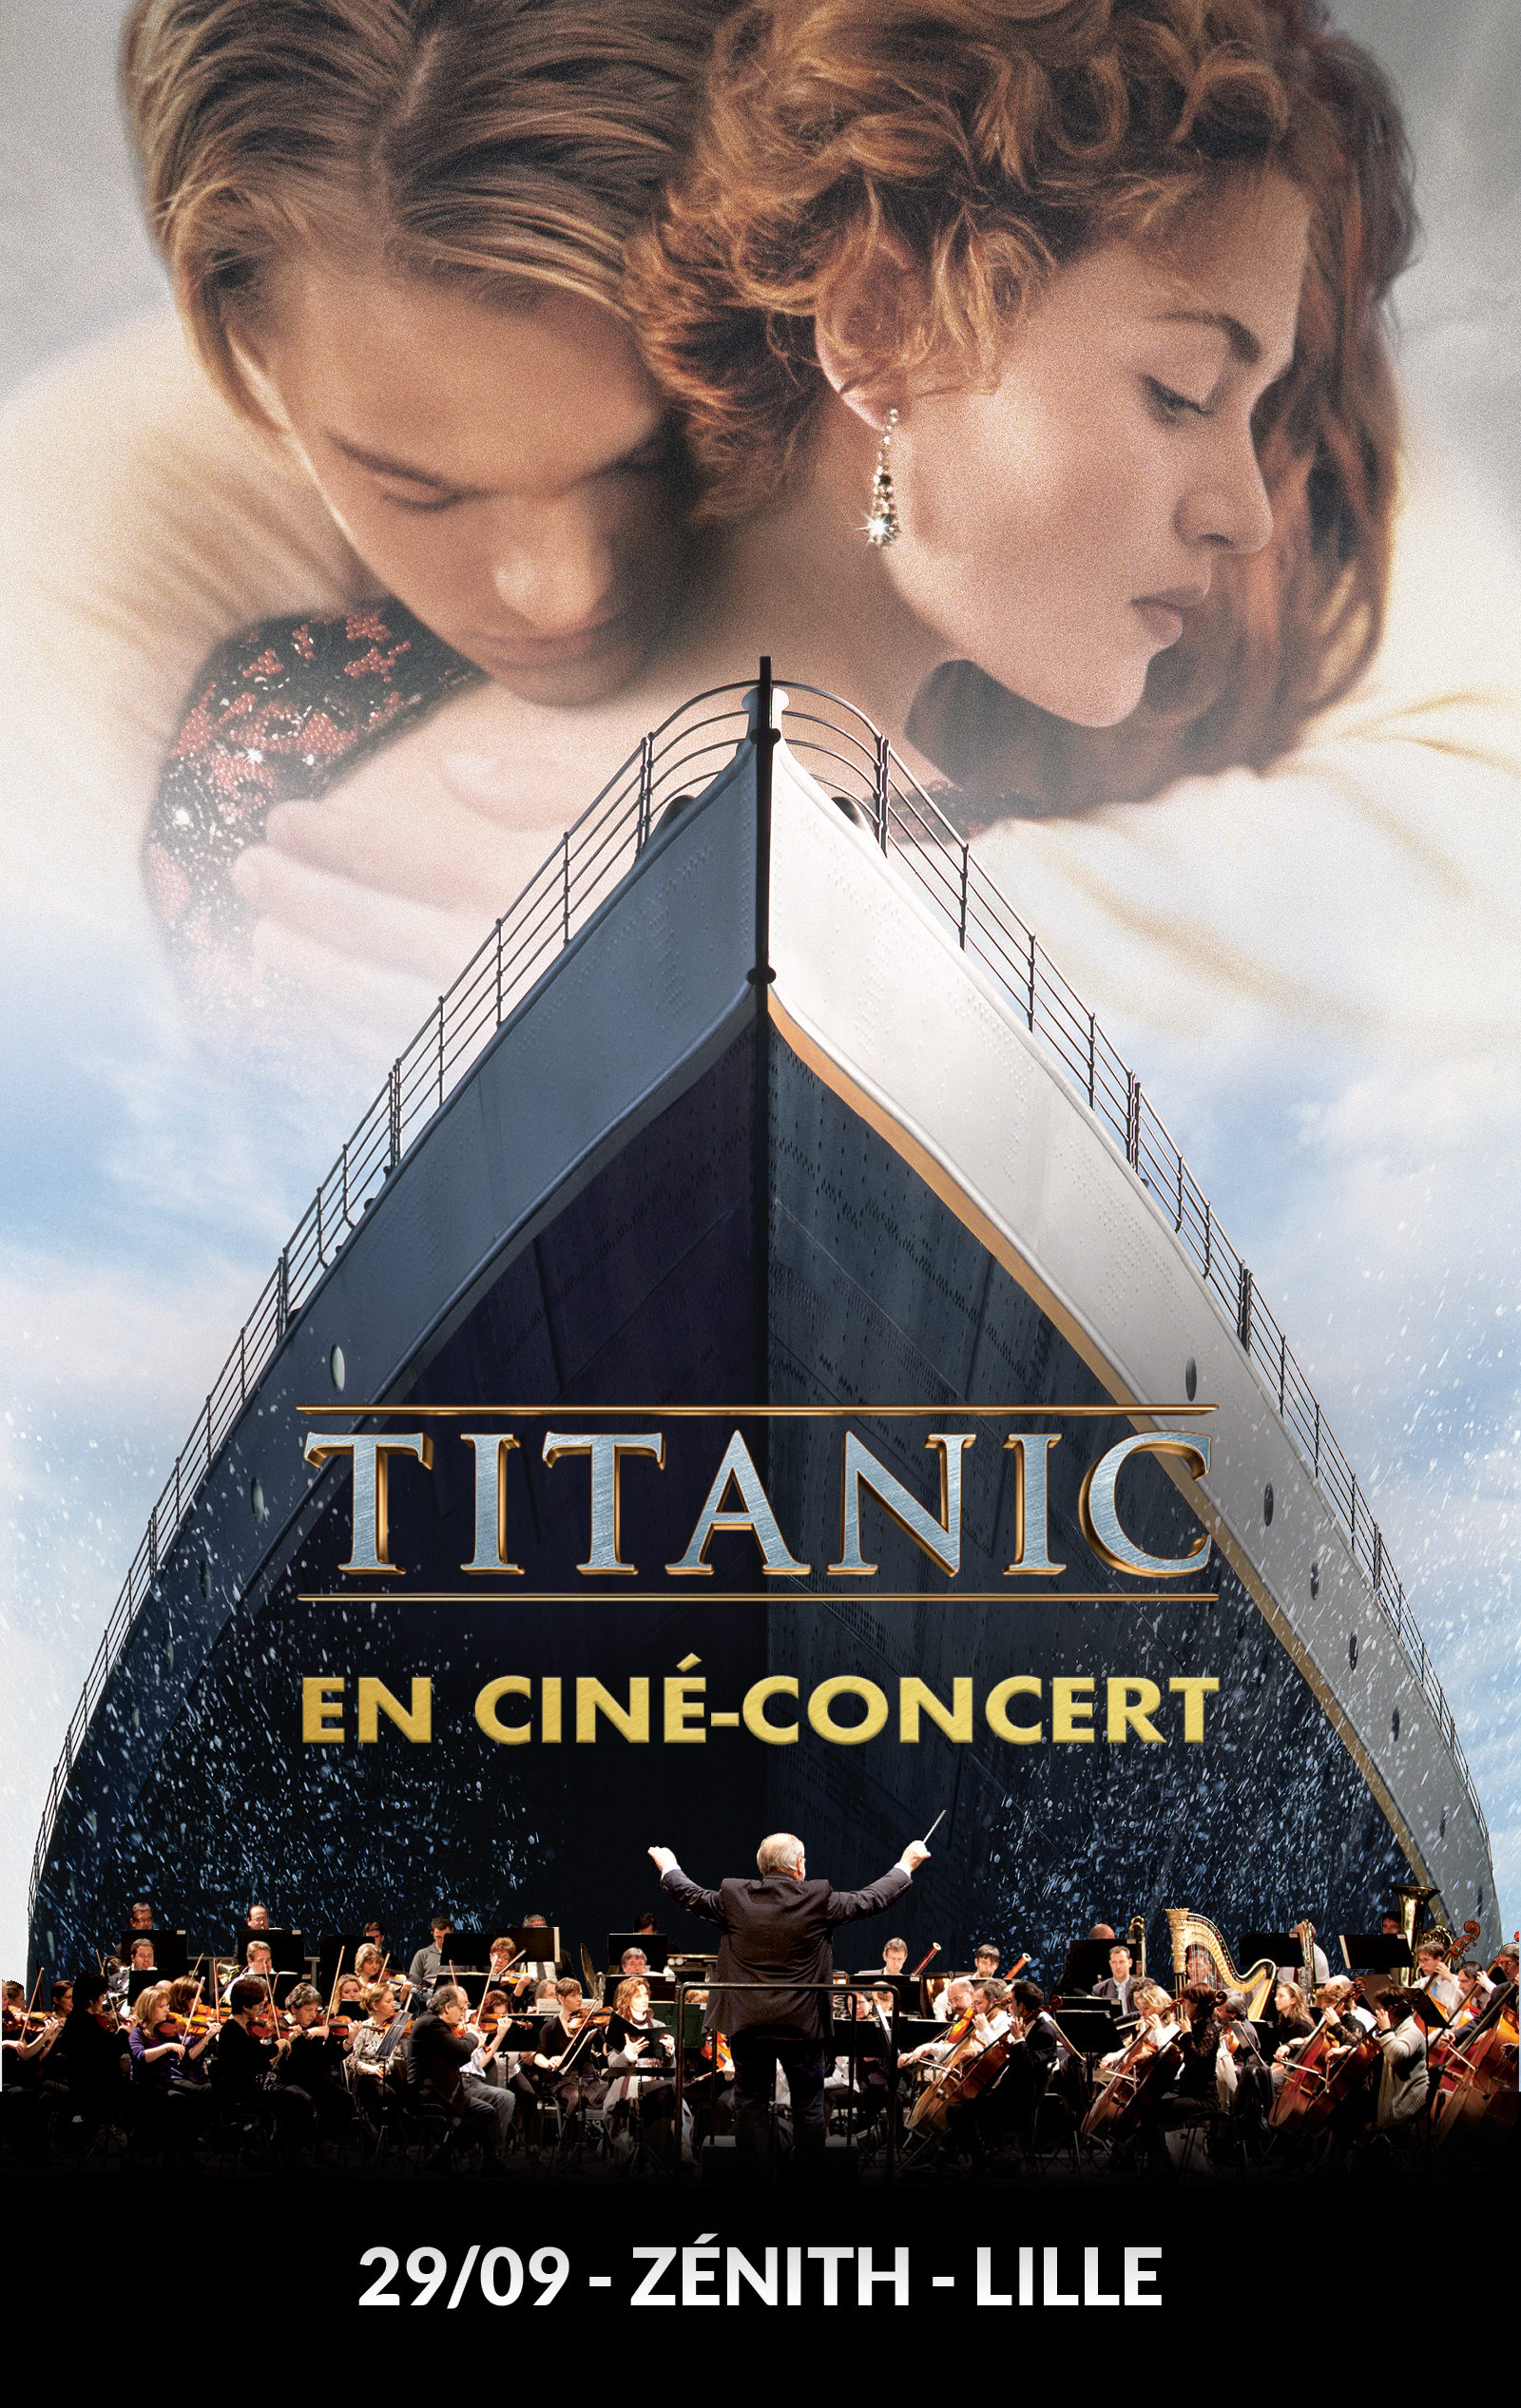 titanic-ticketnet-ecrans-affichage-1600x0-c-default.jpg